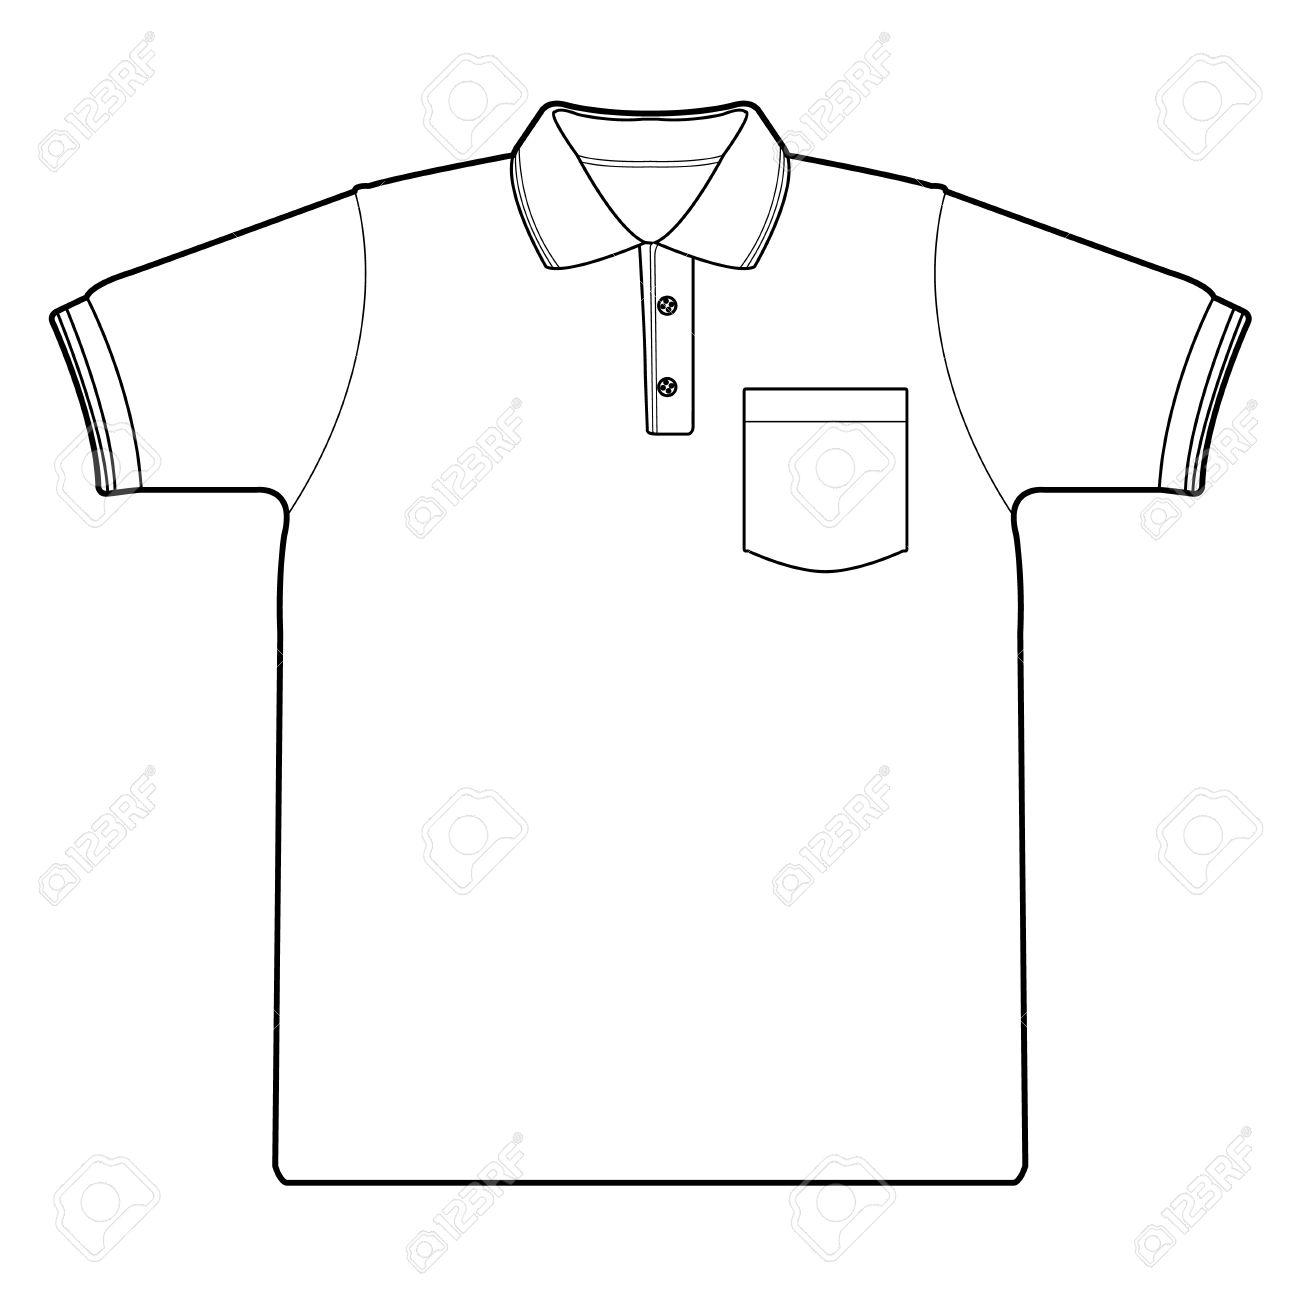 Drawing Of A Shirt